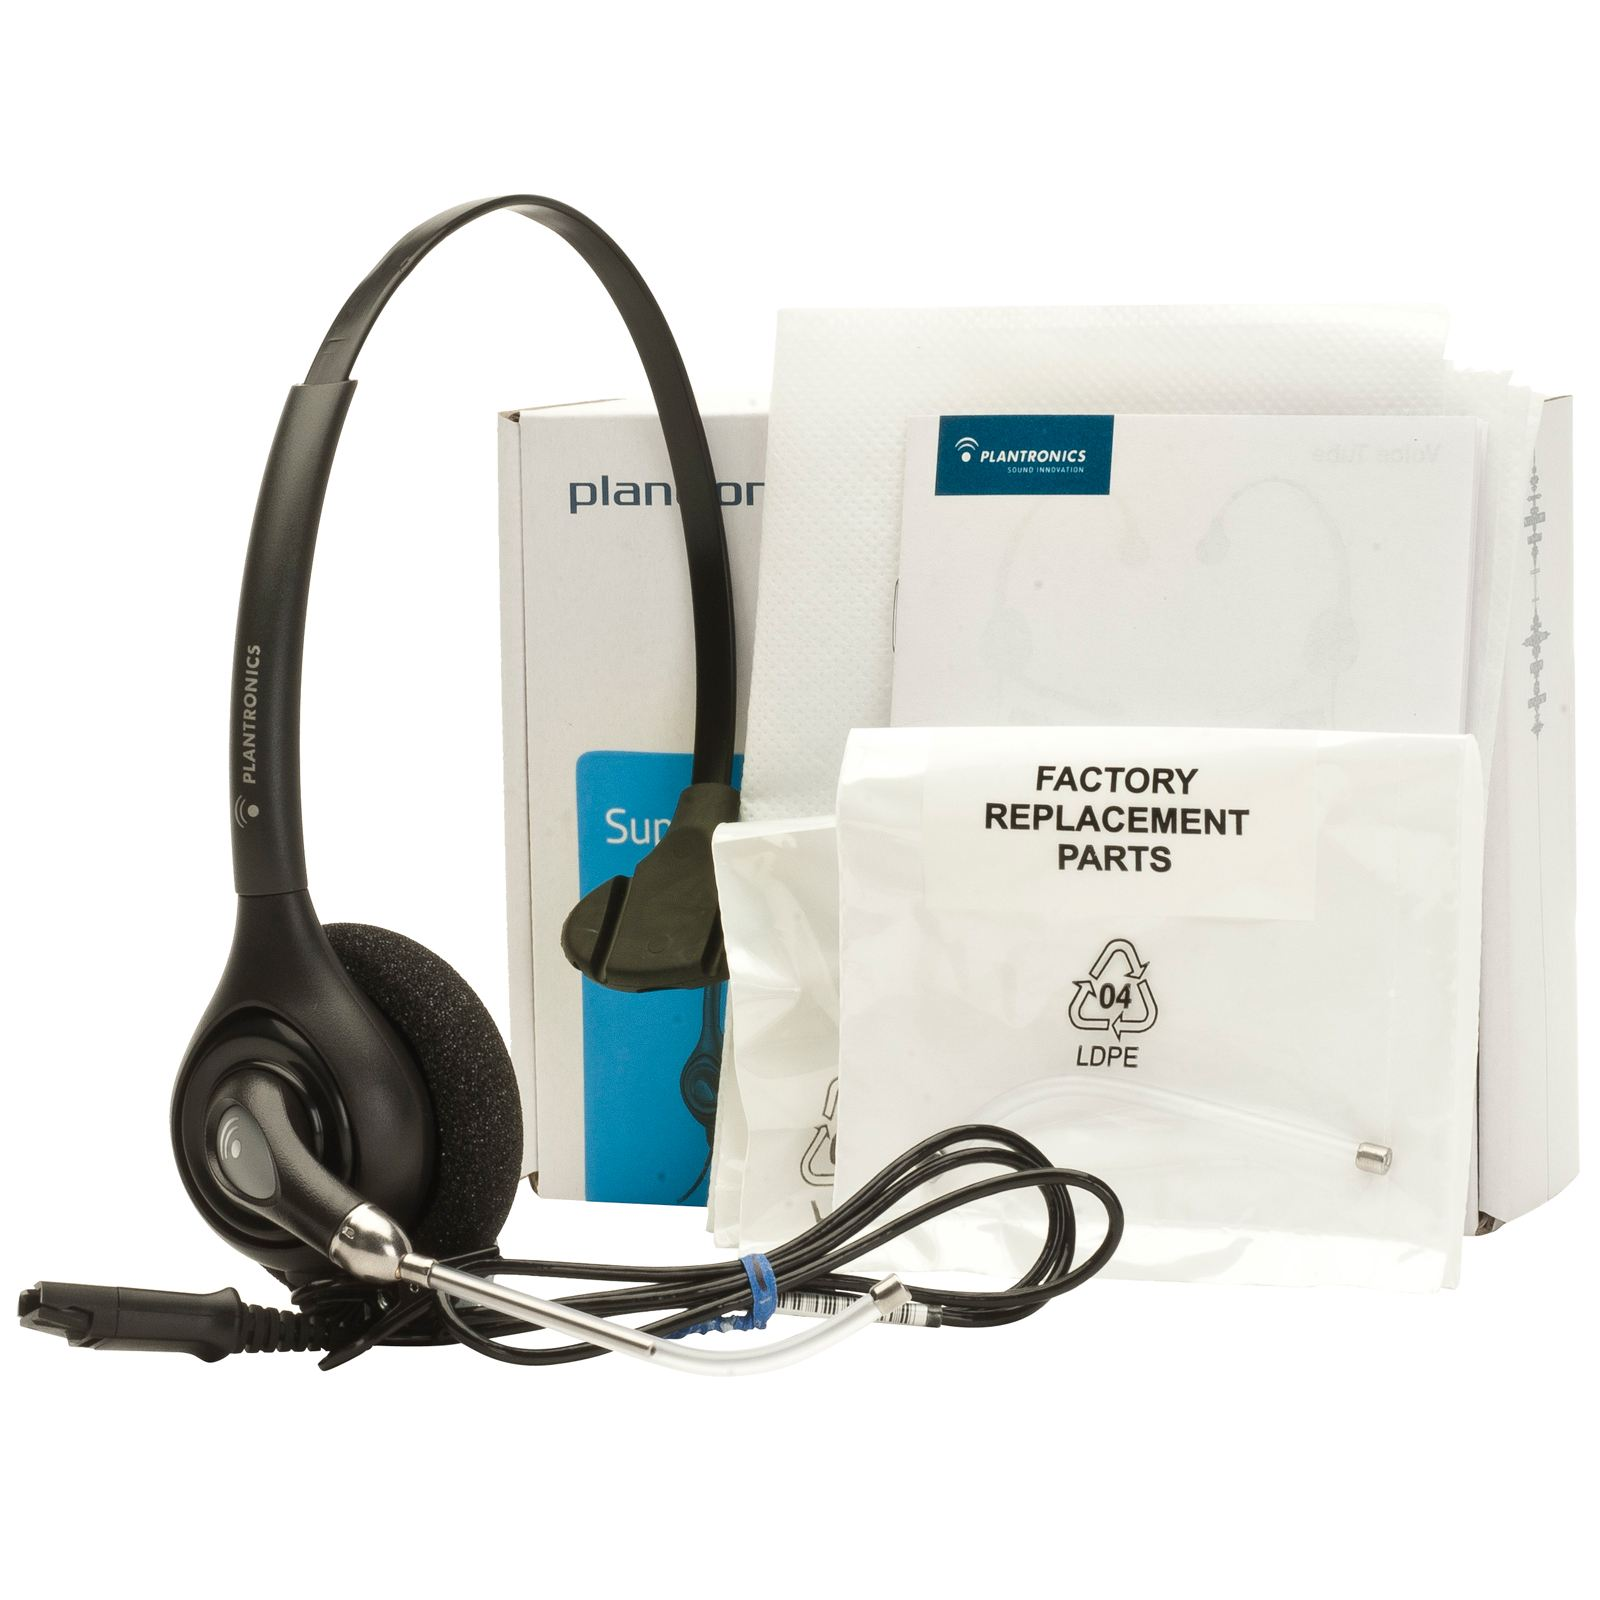 tai-nghe-Plantronics-HW251-SupraPlus-Headset.jpg